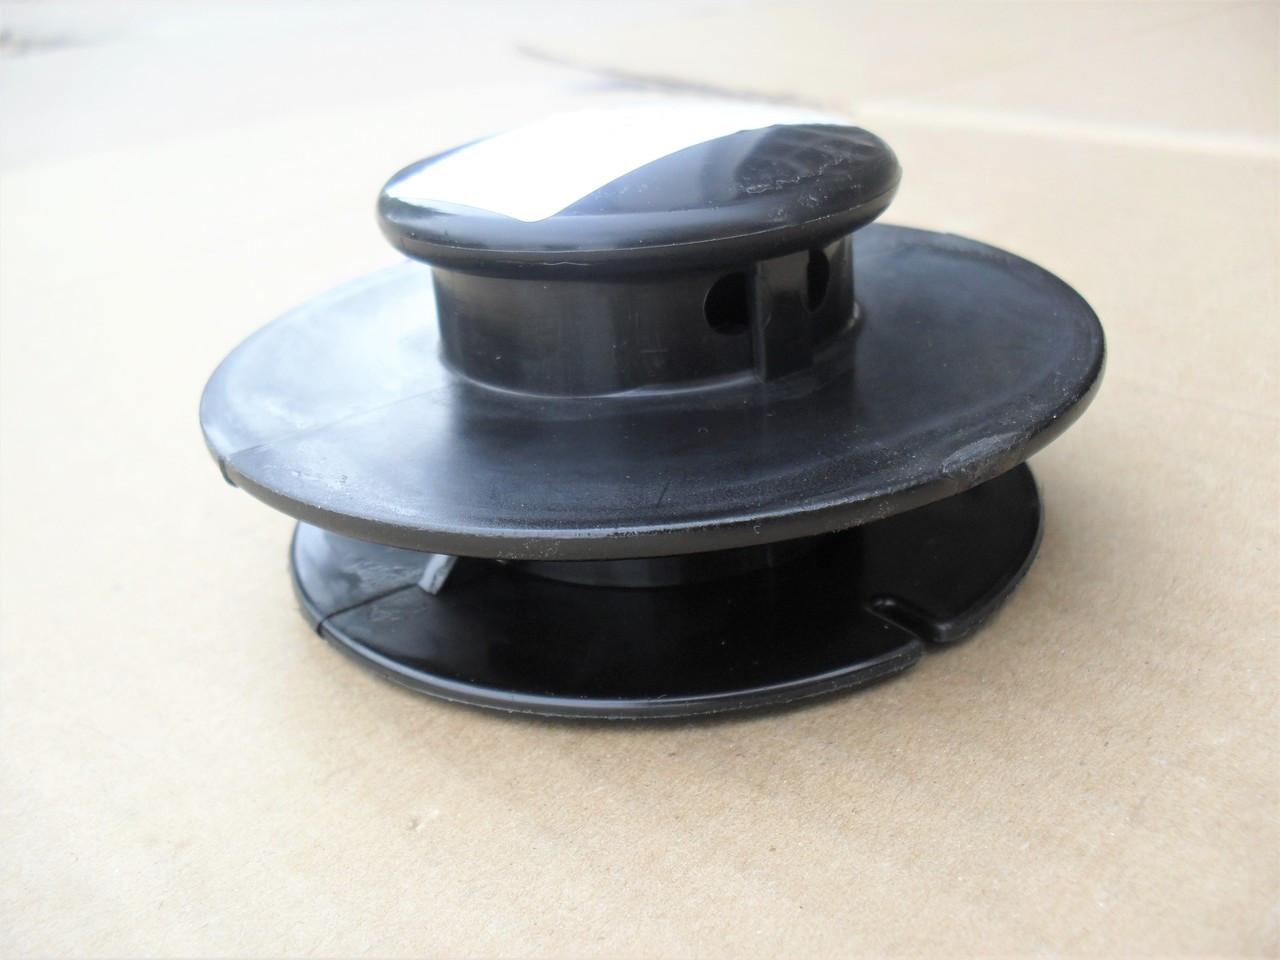 Bump Feed Head Spool Knob for Shindaiwa String Trimmer 999091560, 99909-1560